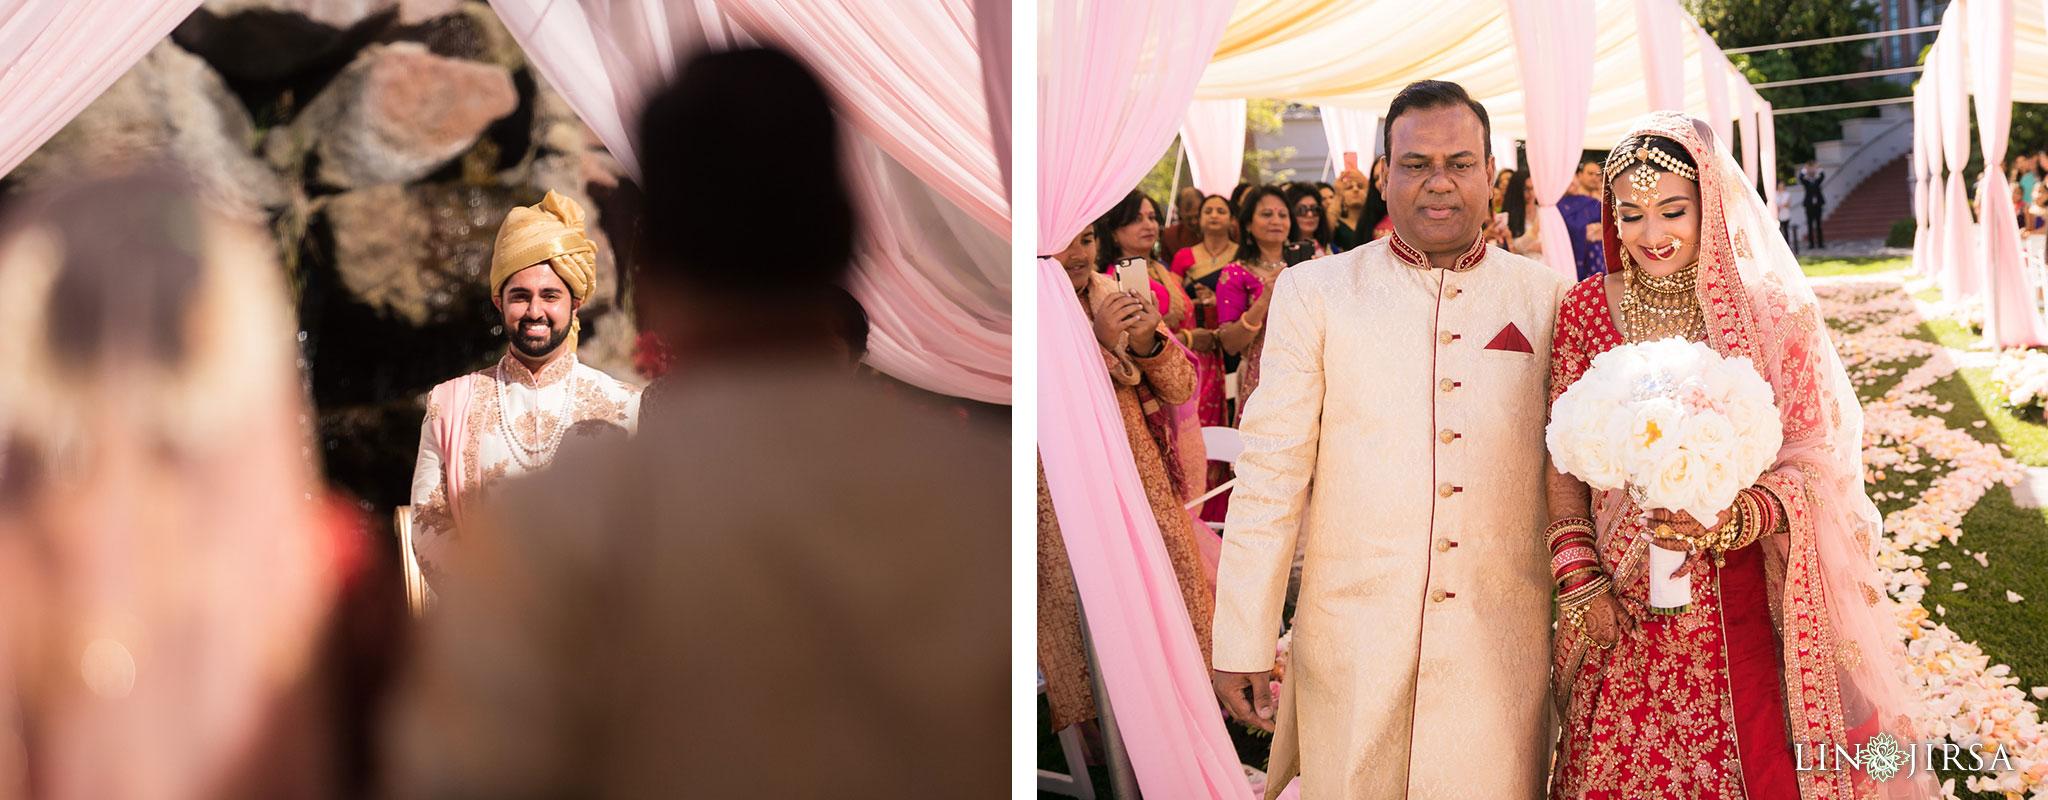 30 four seasons westlake village indian wedding ceremony photography